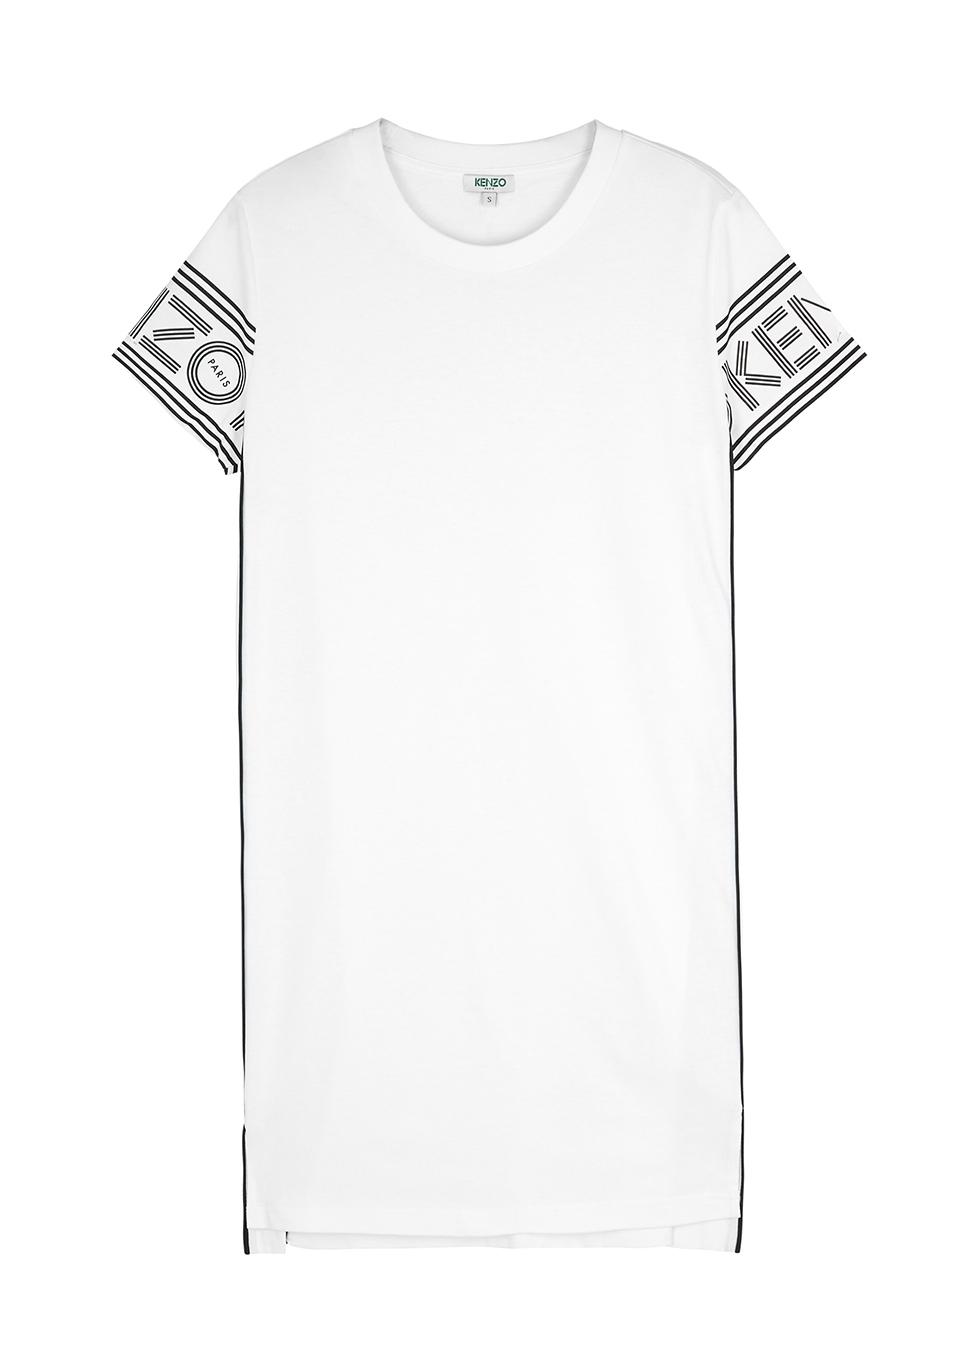 344c95cea Kenzo - Designer Sweatshirts, T-Shirts, Bags - Harvey Nichols